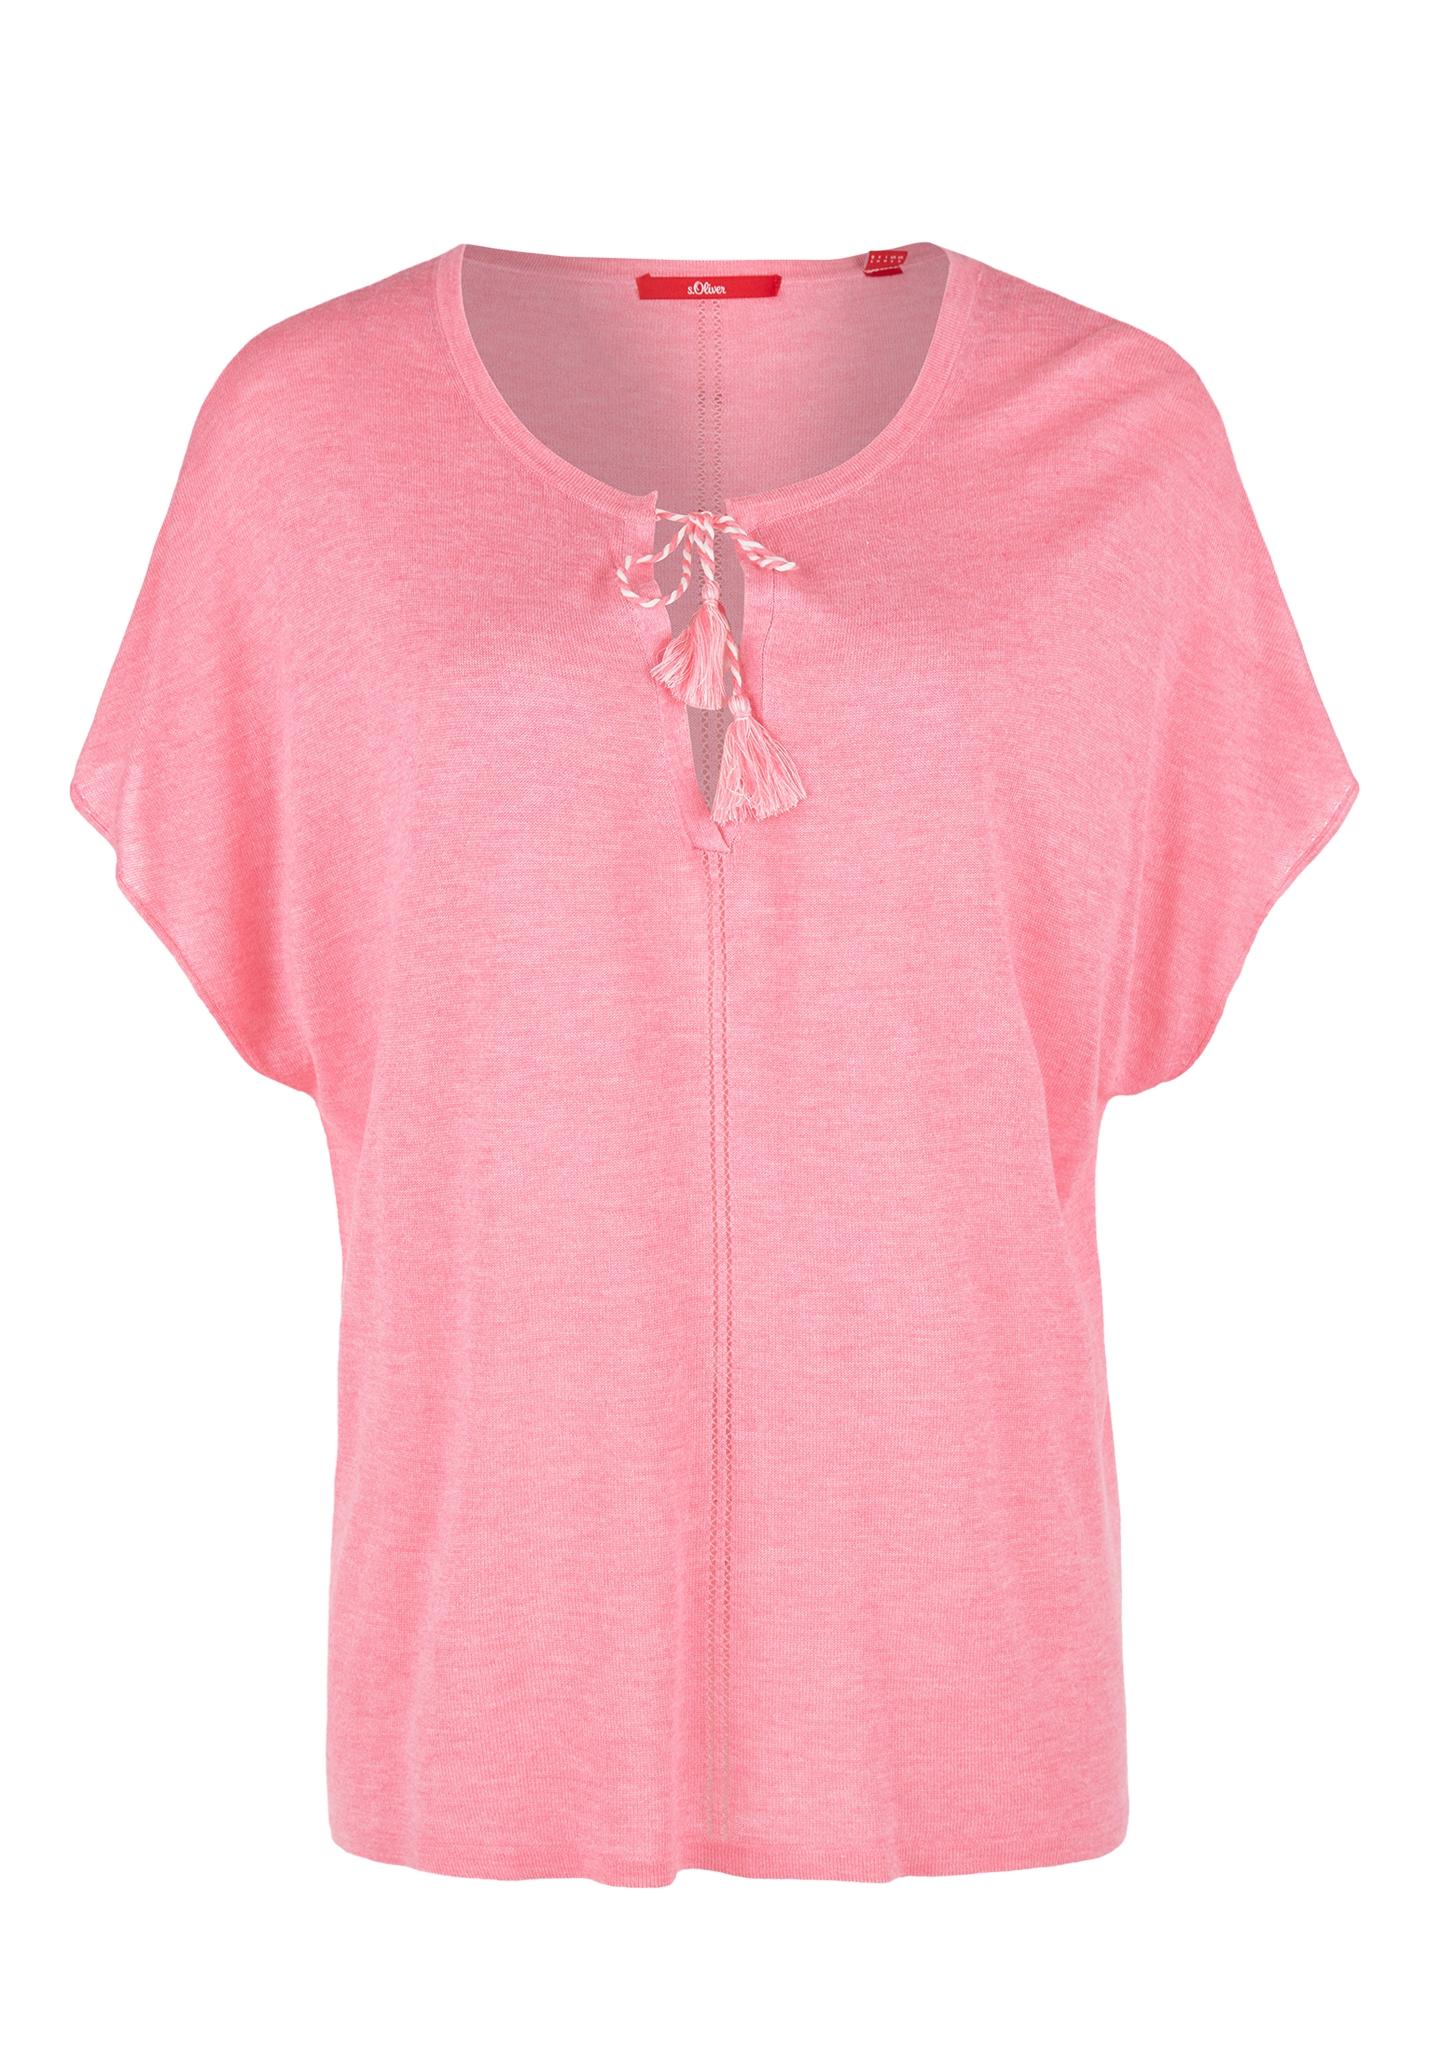 Kurzarmpullover | Bekleidung > Pullover > Kurzarmpullover | Rosa | 80% viskose -  20% polyester | s.Oliver